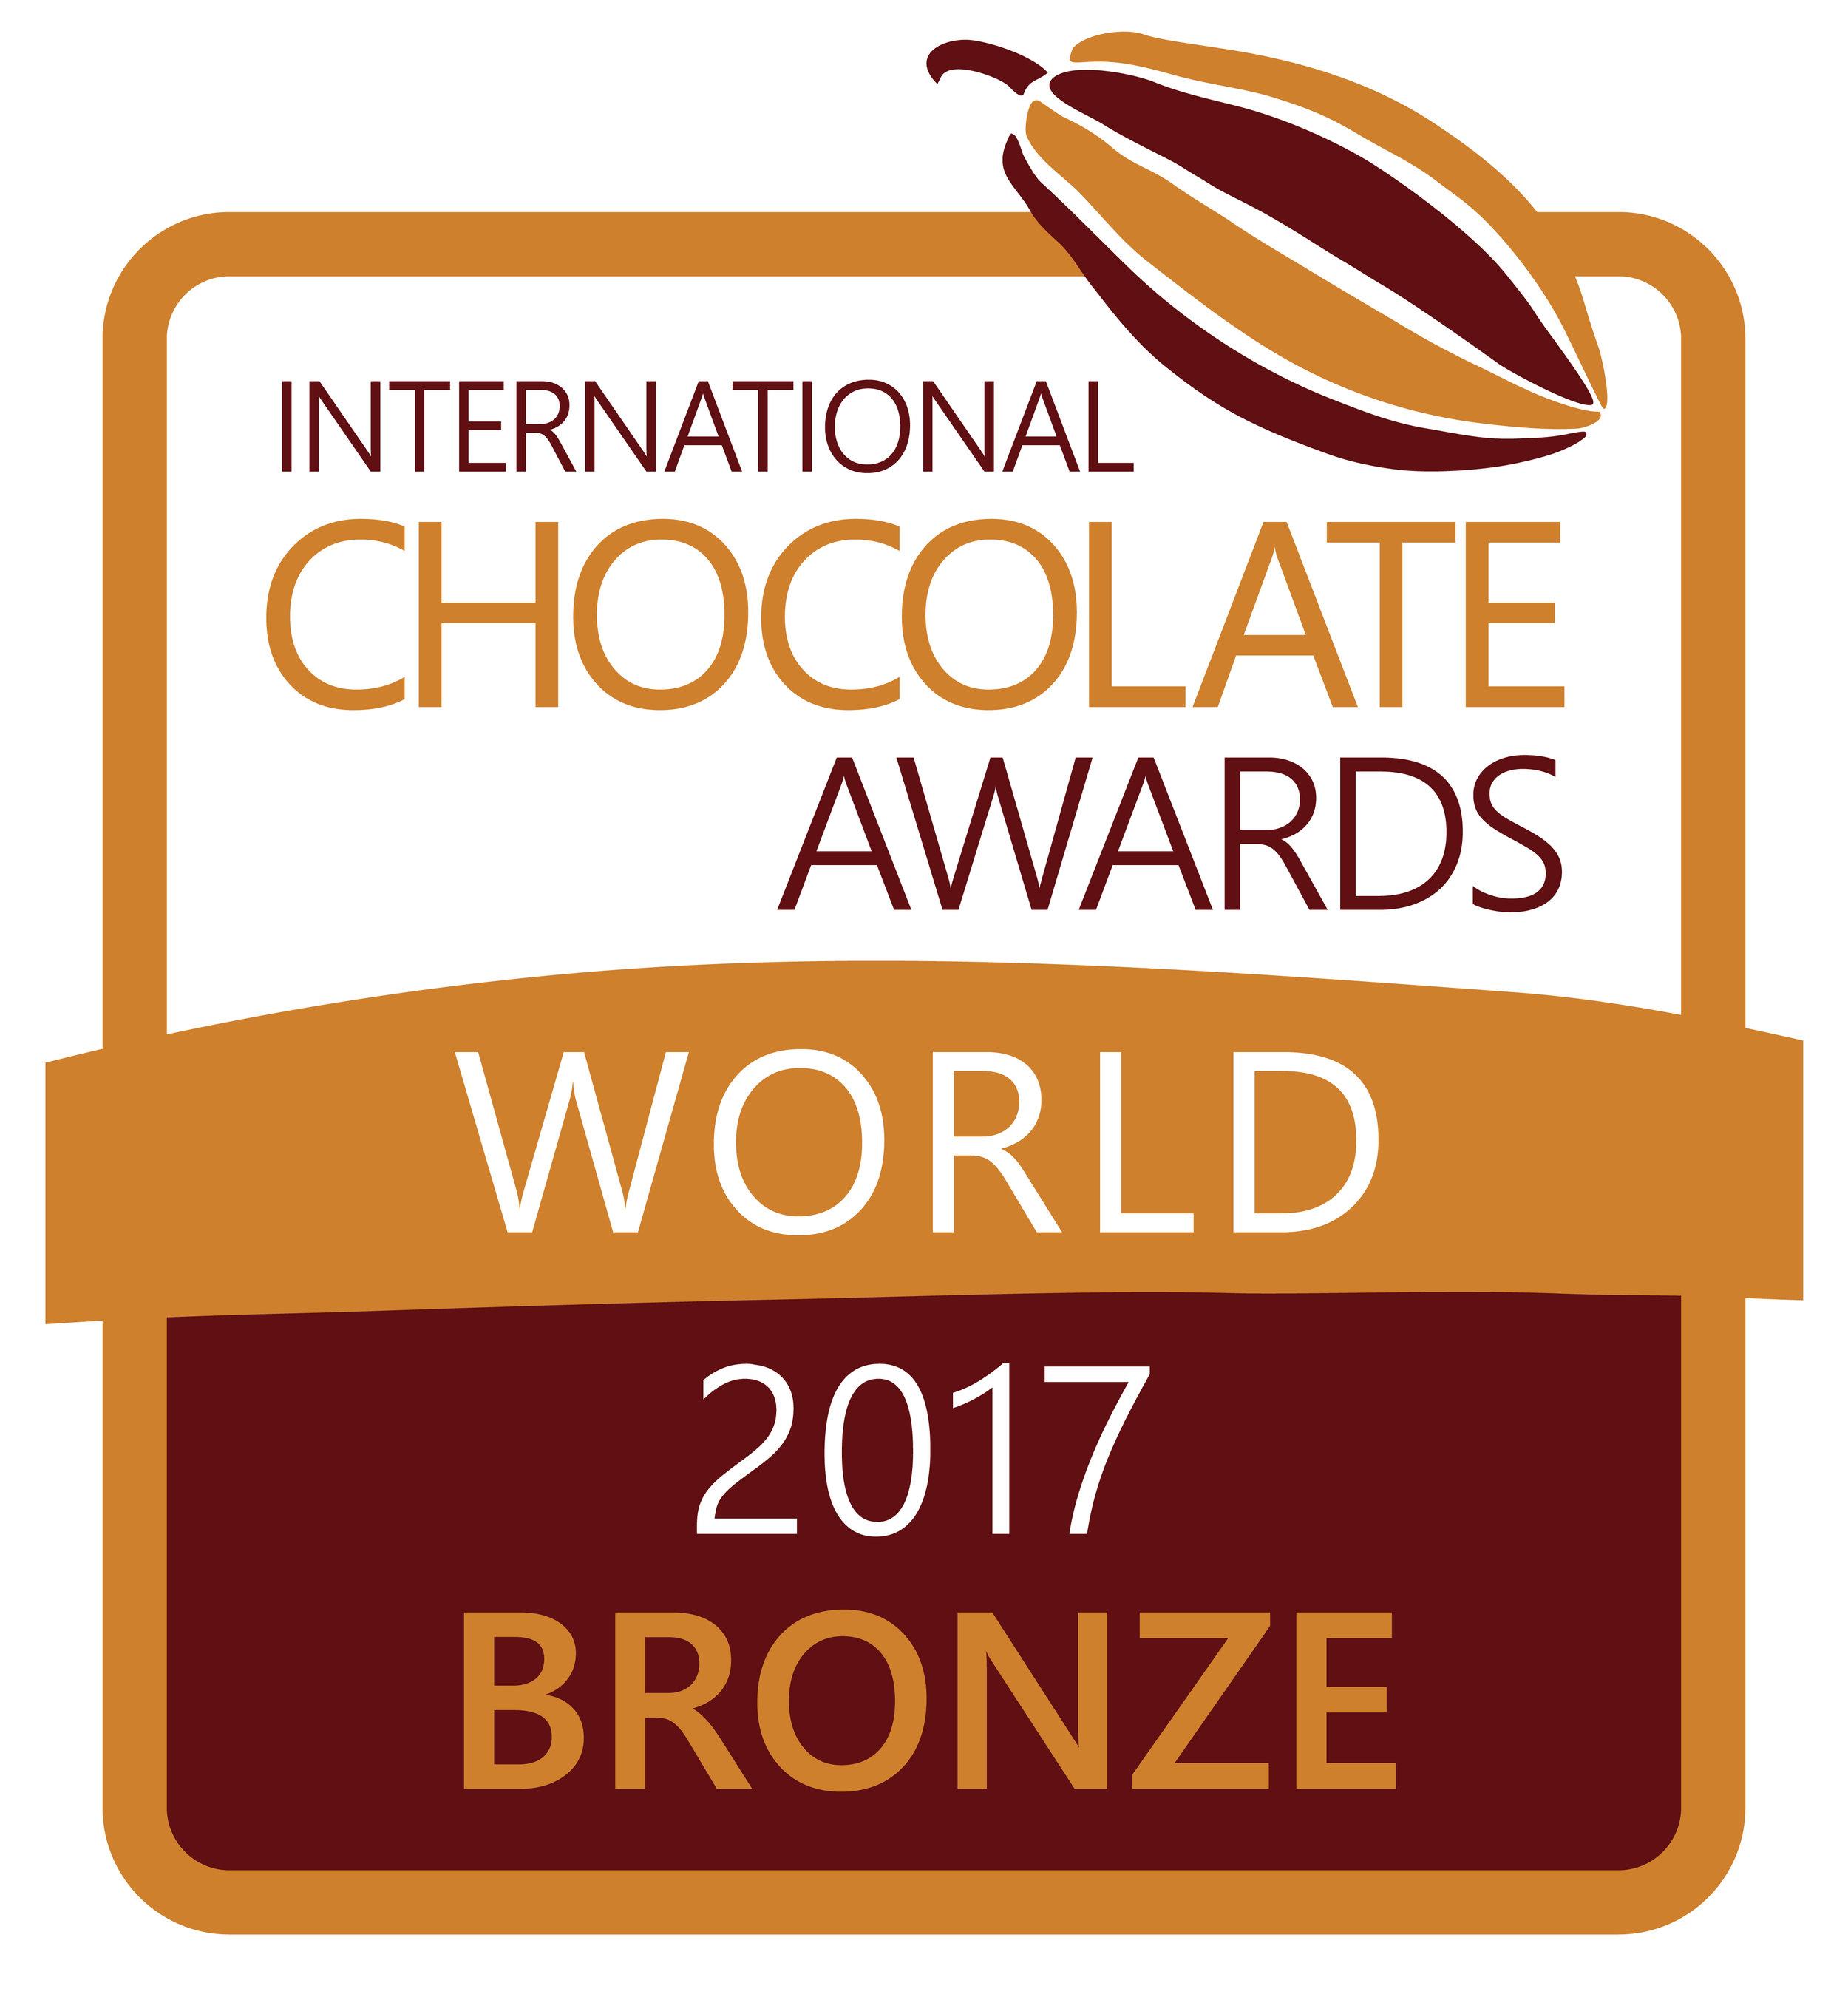 ica-prize-logo-2017-bronze-world-rgb.jpg